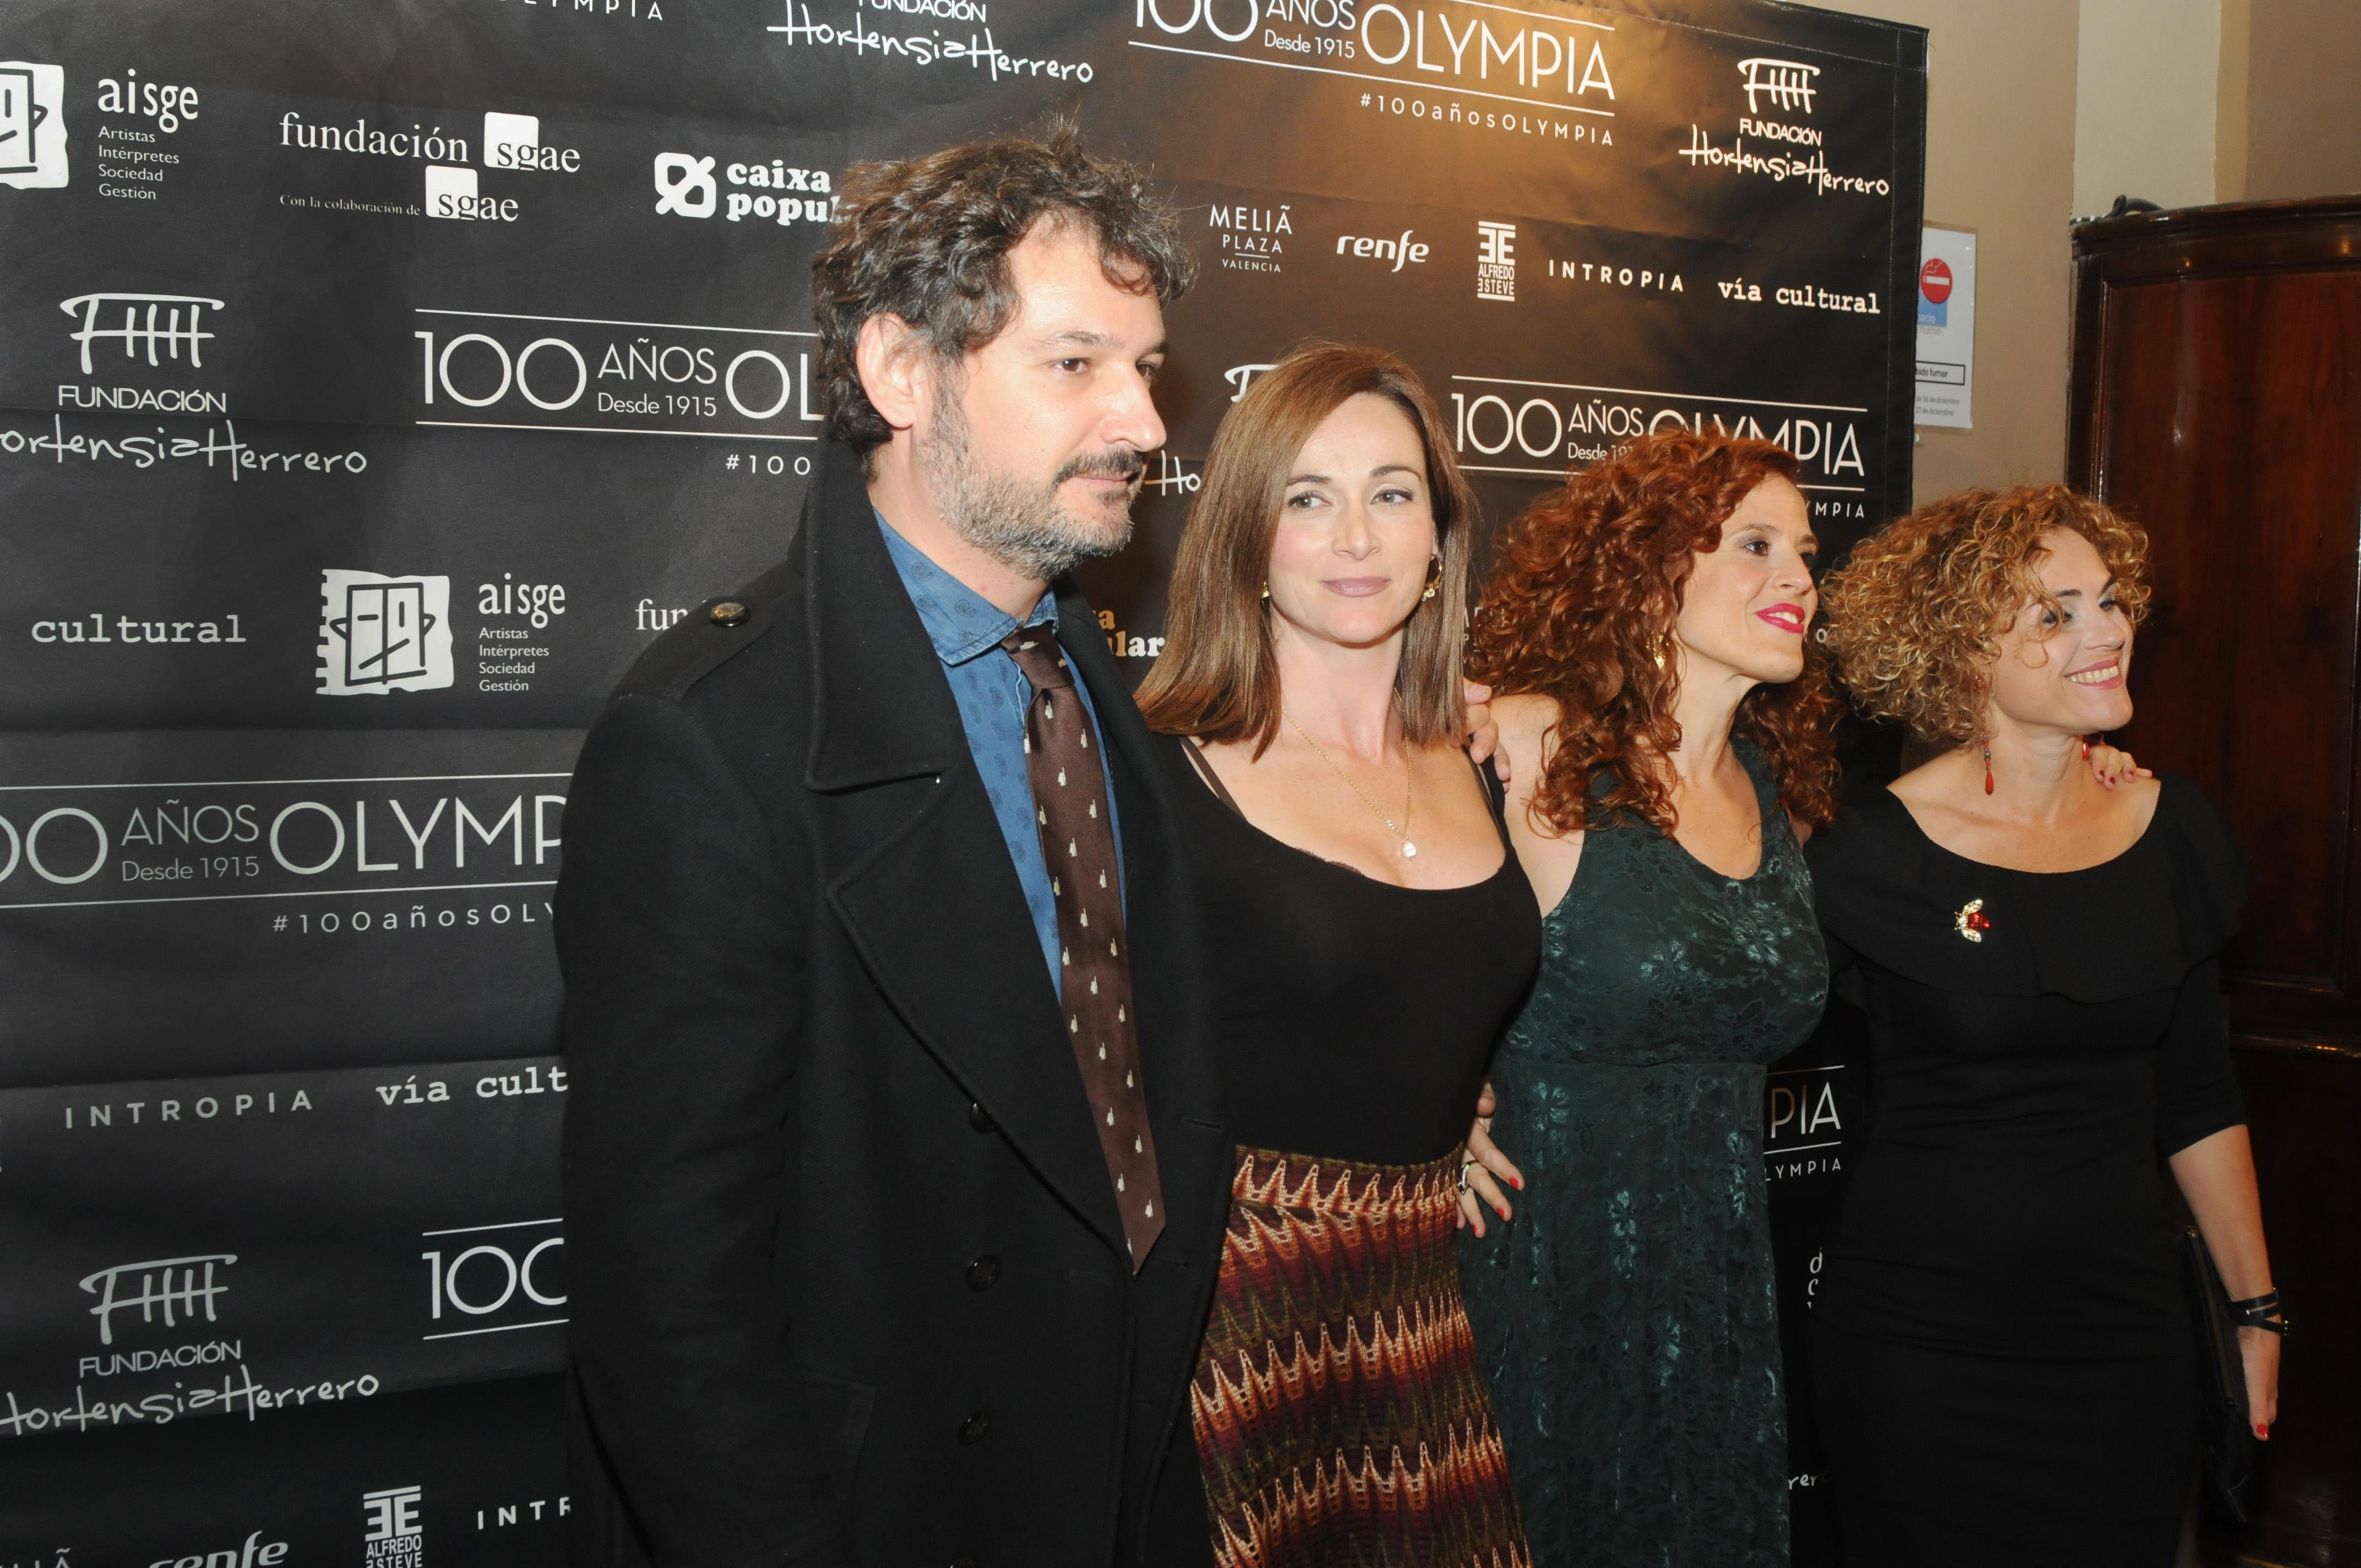 Gala 100 años Olympia.JPG